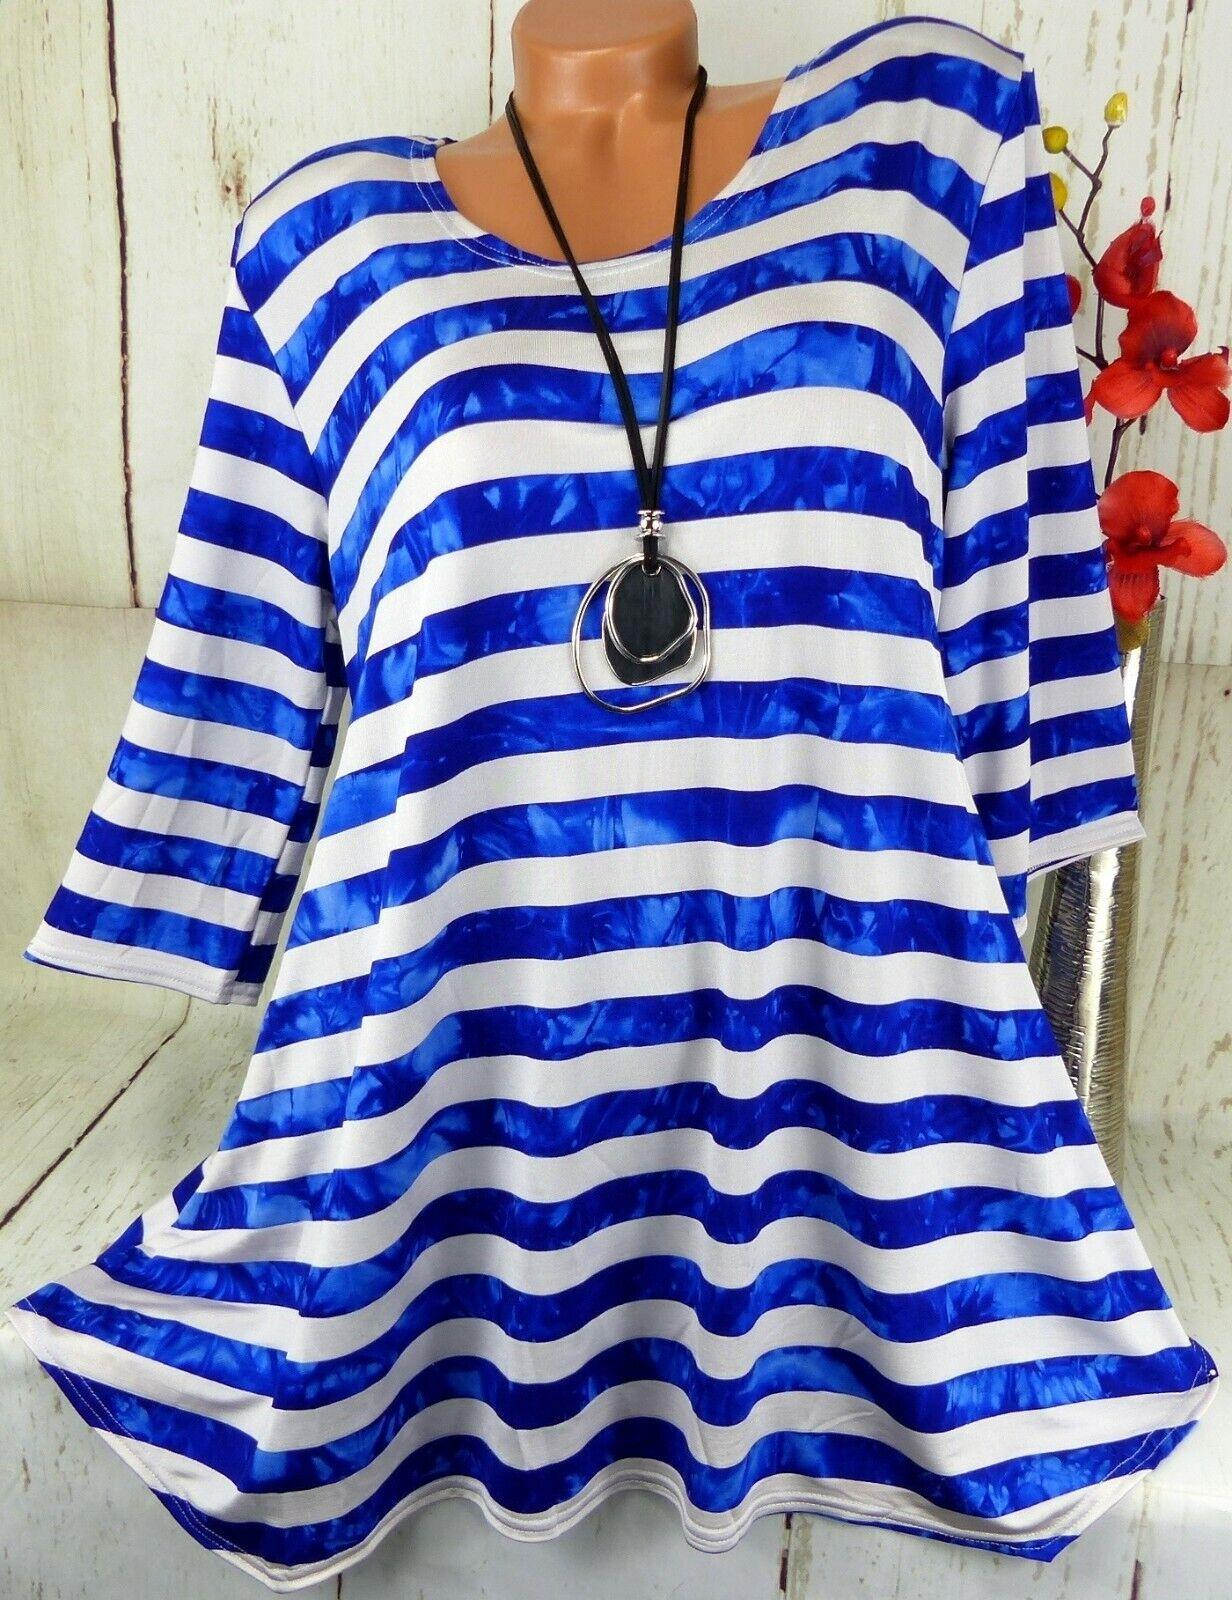 New Jersey Tunika Bluse Kleid Shirt Top Longshirt Lagenlook A-Linie XL 44 46